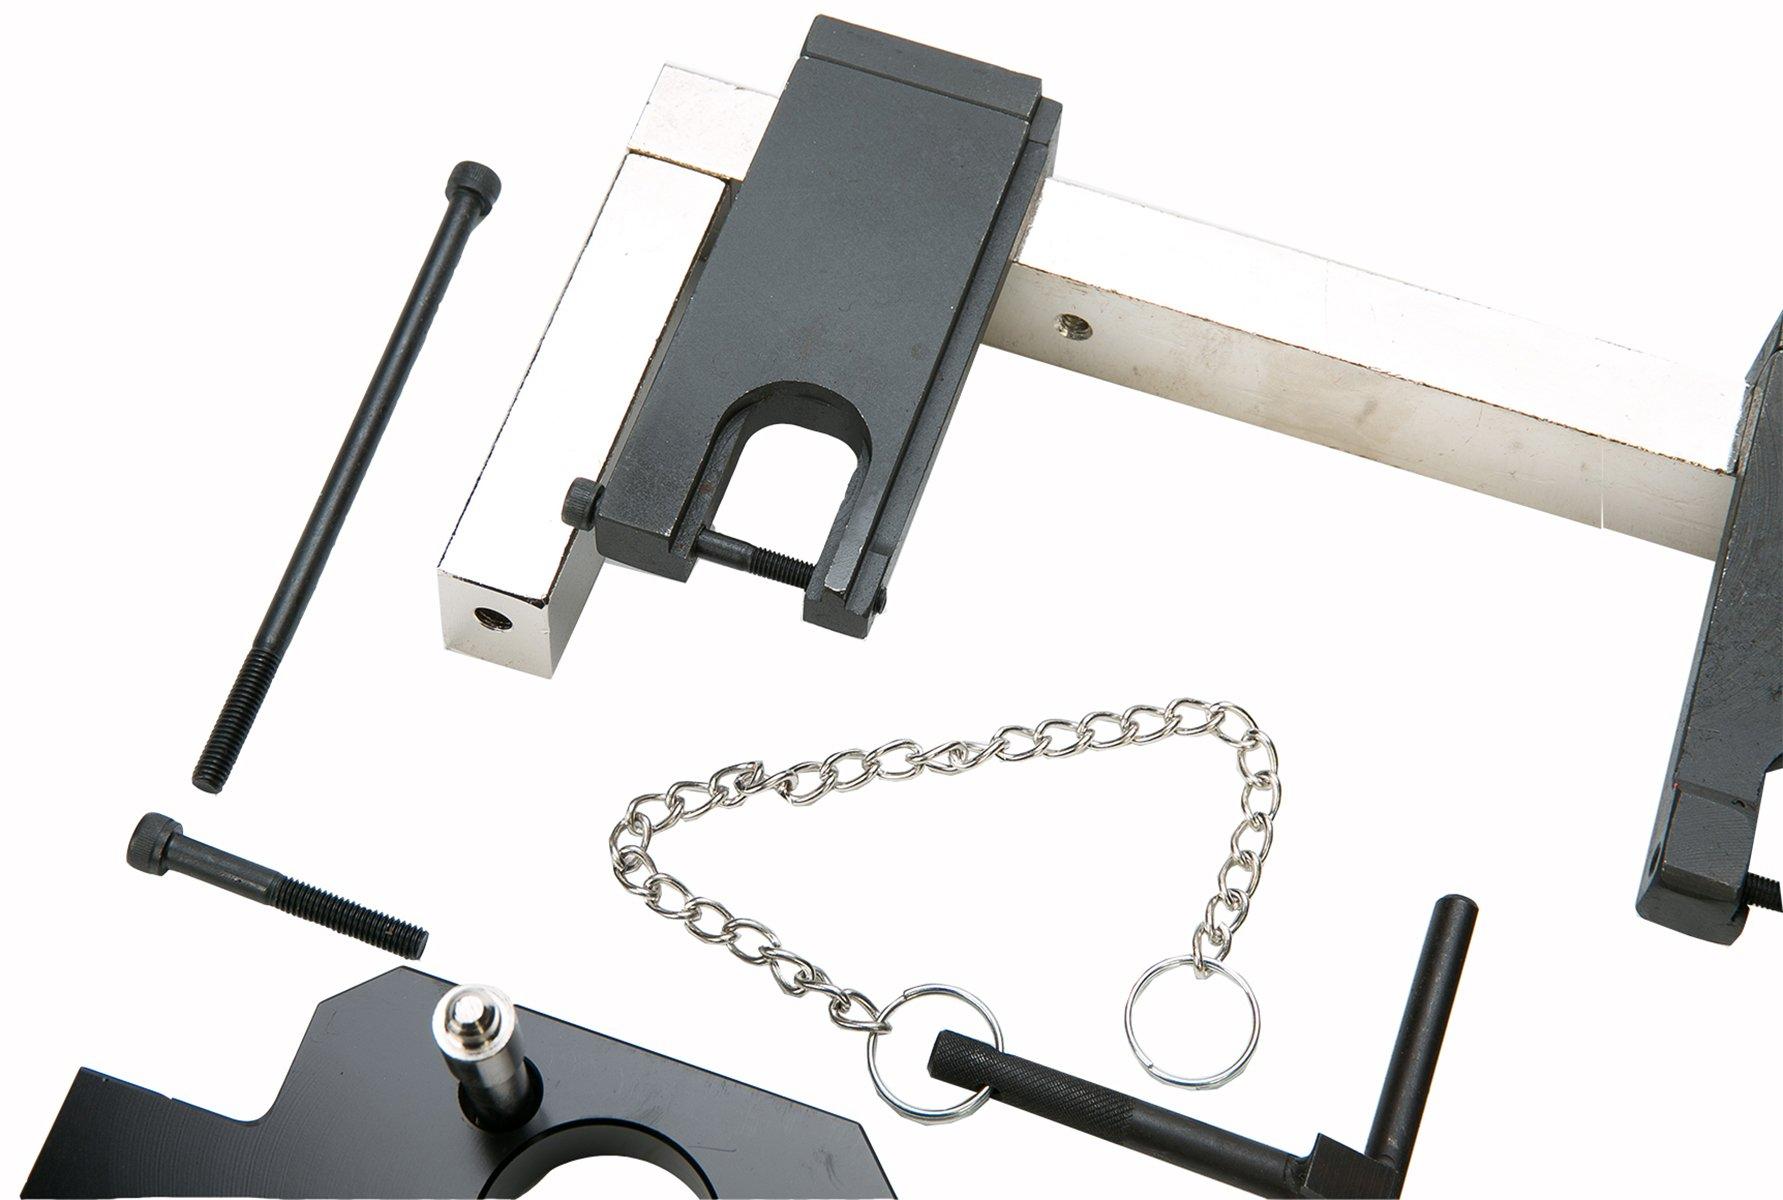 8MILELAKE Engine Alignment Locking Timing Tool Compatible for BMW N20 N26 Vanos Cam Camshaft by 8MILELAKE (Image #3)